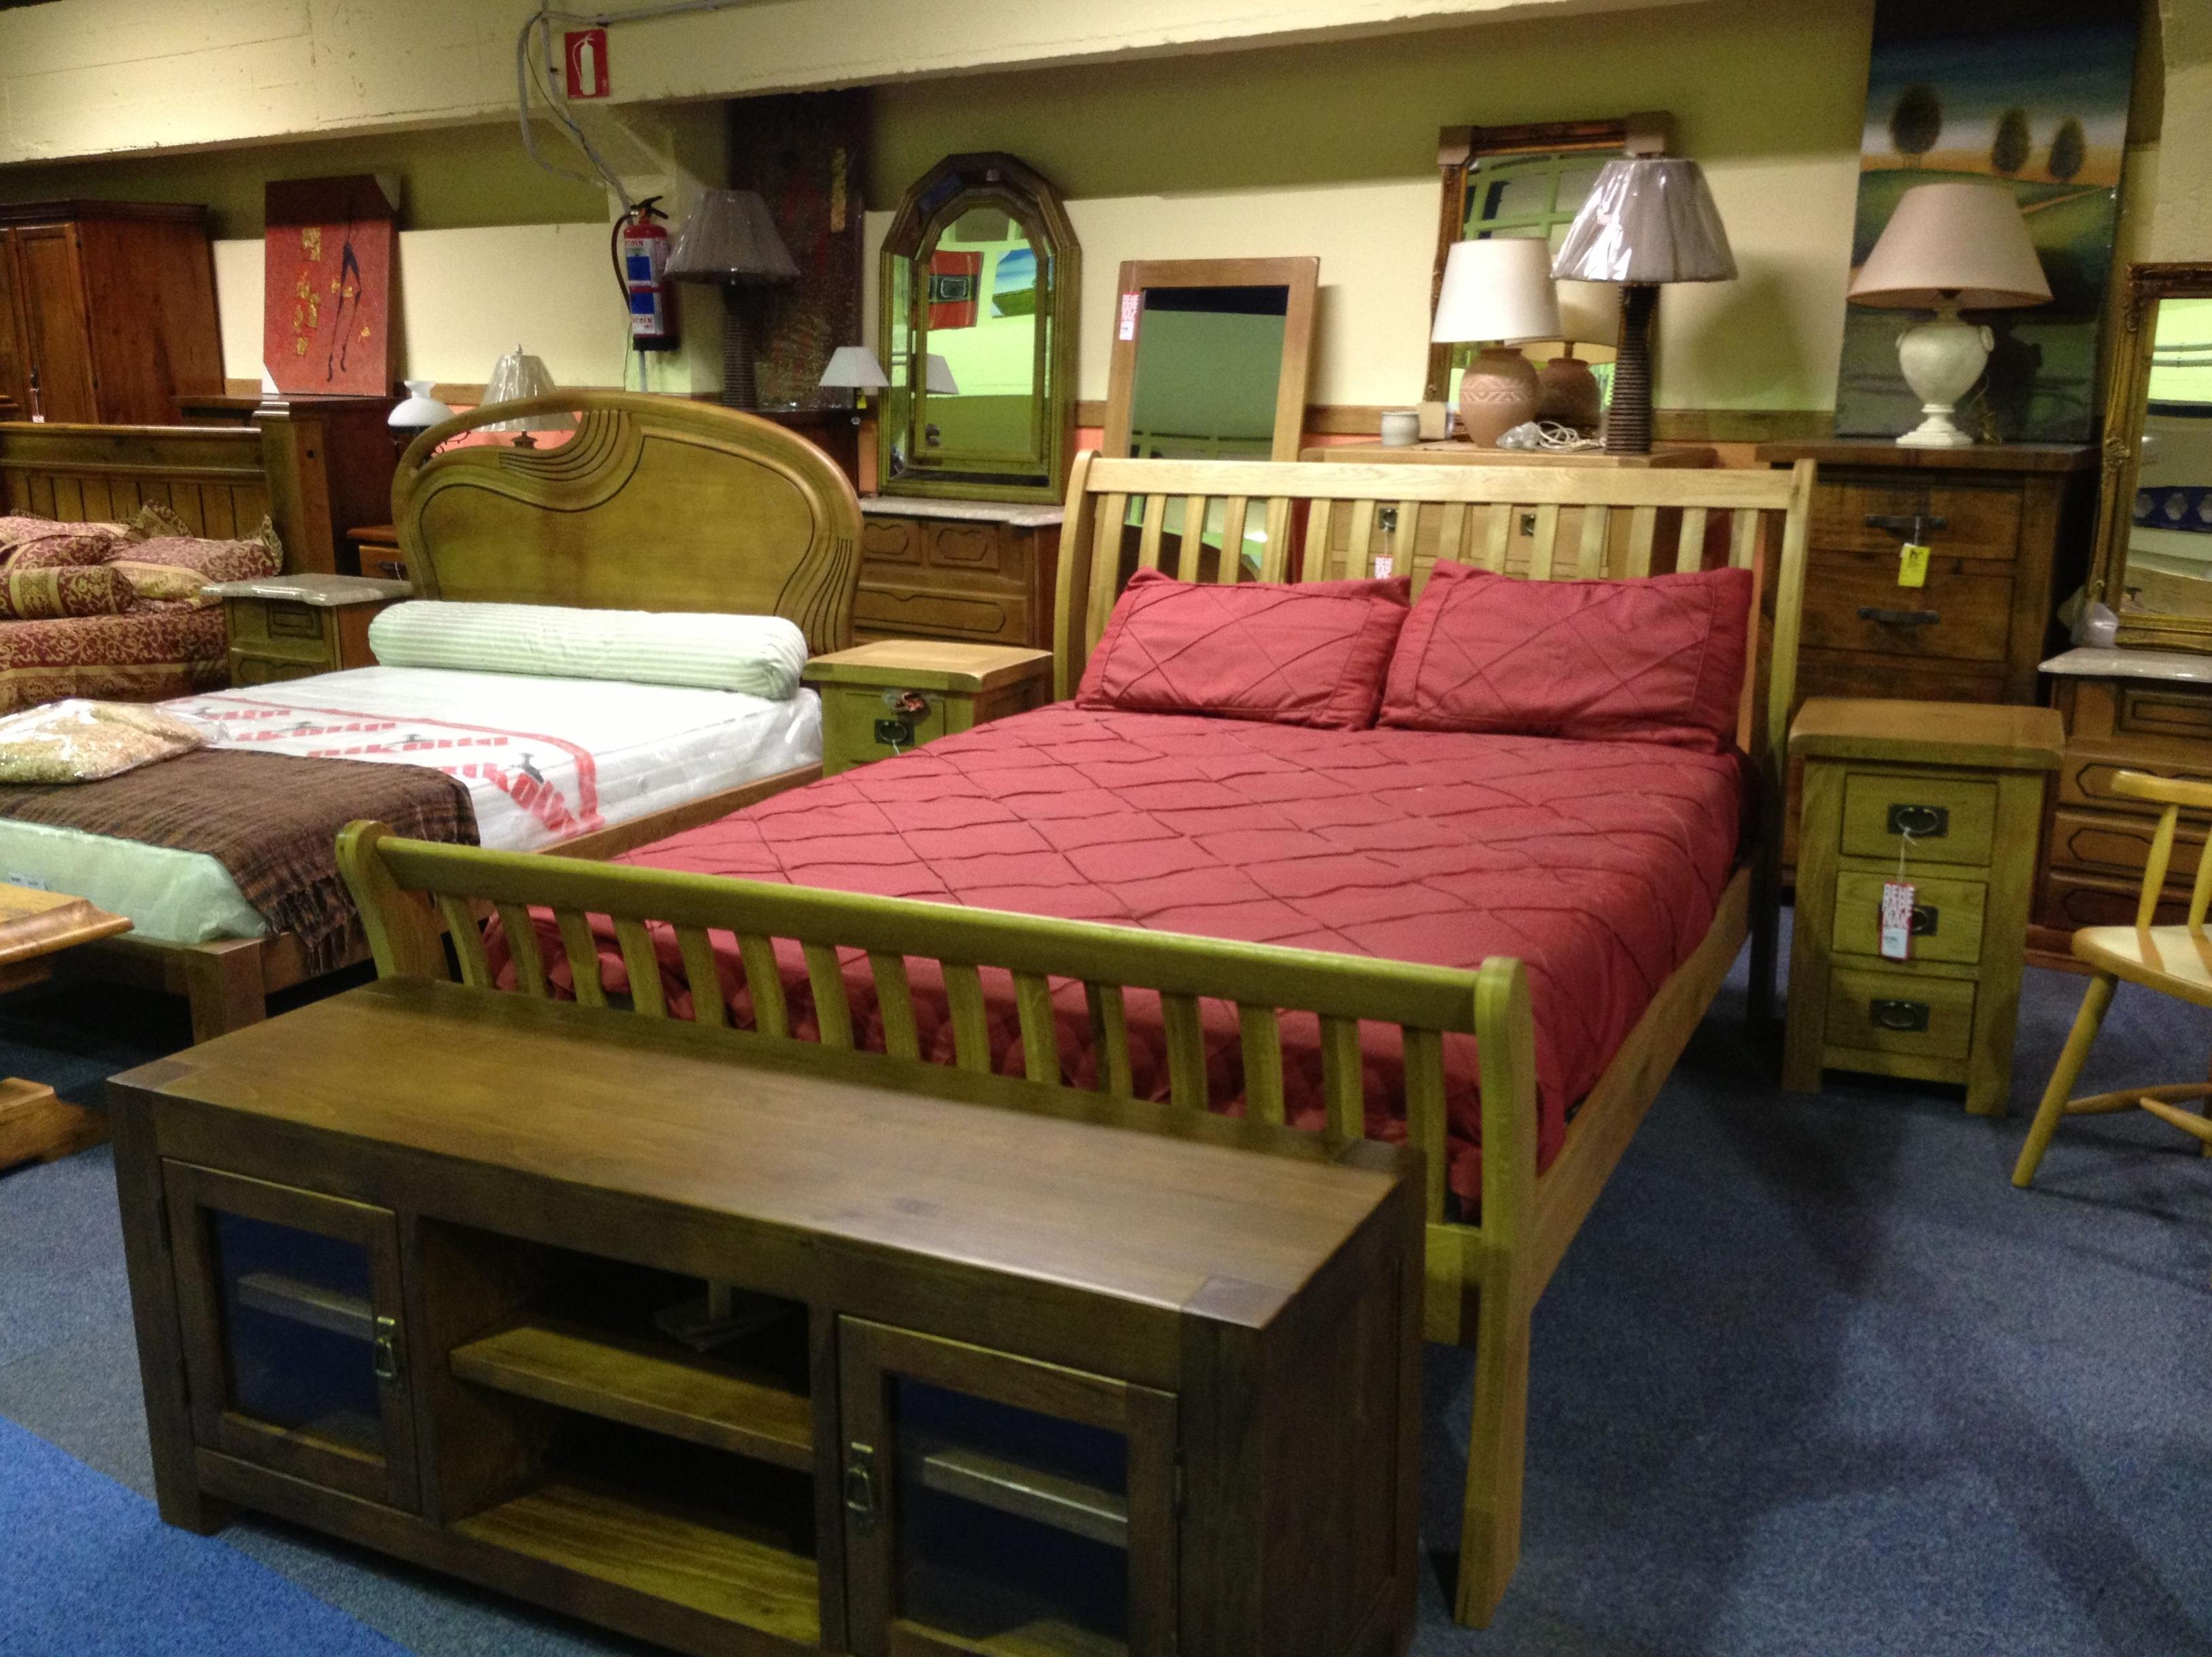 Muebles De Hosteleria Segunda Mano Idea Creativa Della Casa E  # Muebles Hosteleria Baratos